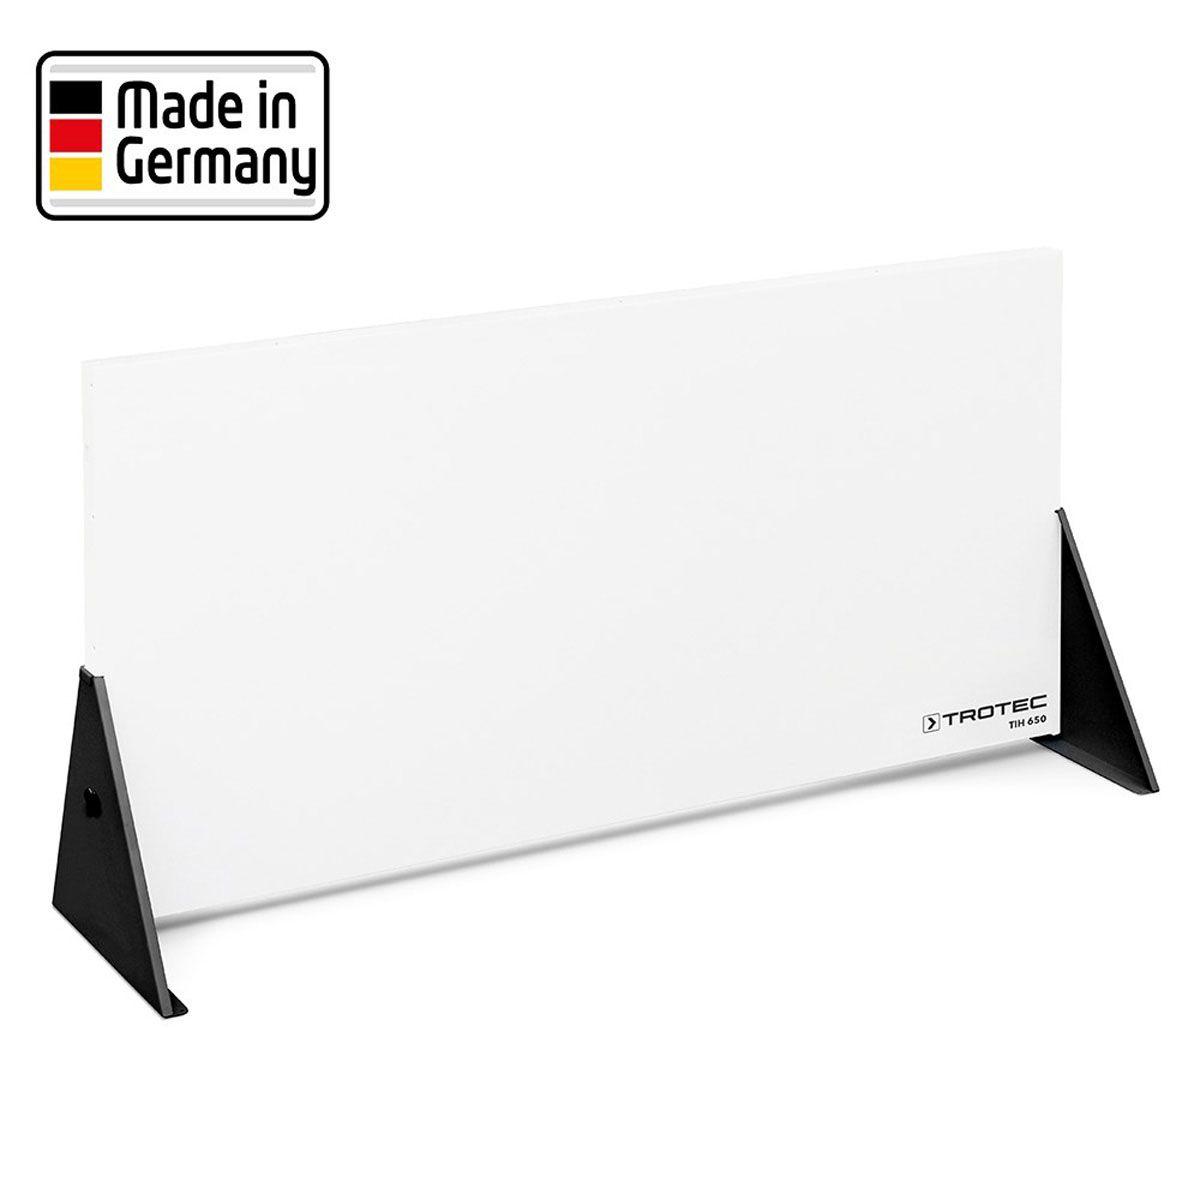 Infrarot-Heizplatte, TIH 650, 36 x 1370 x 625 mm